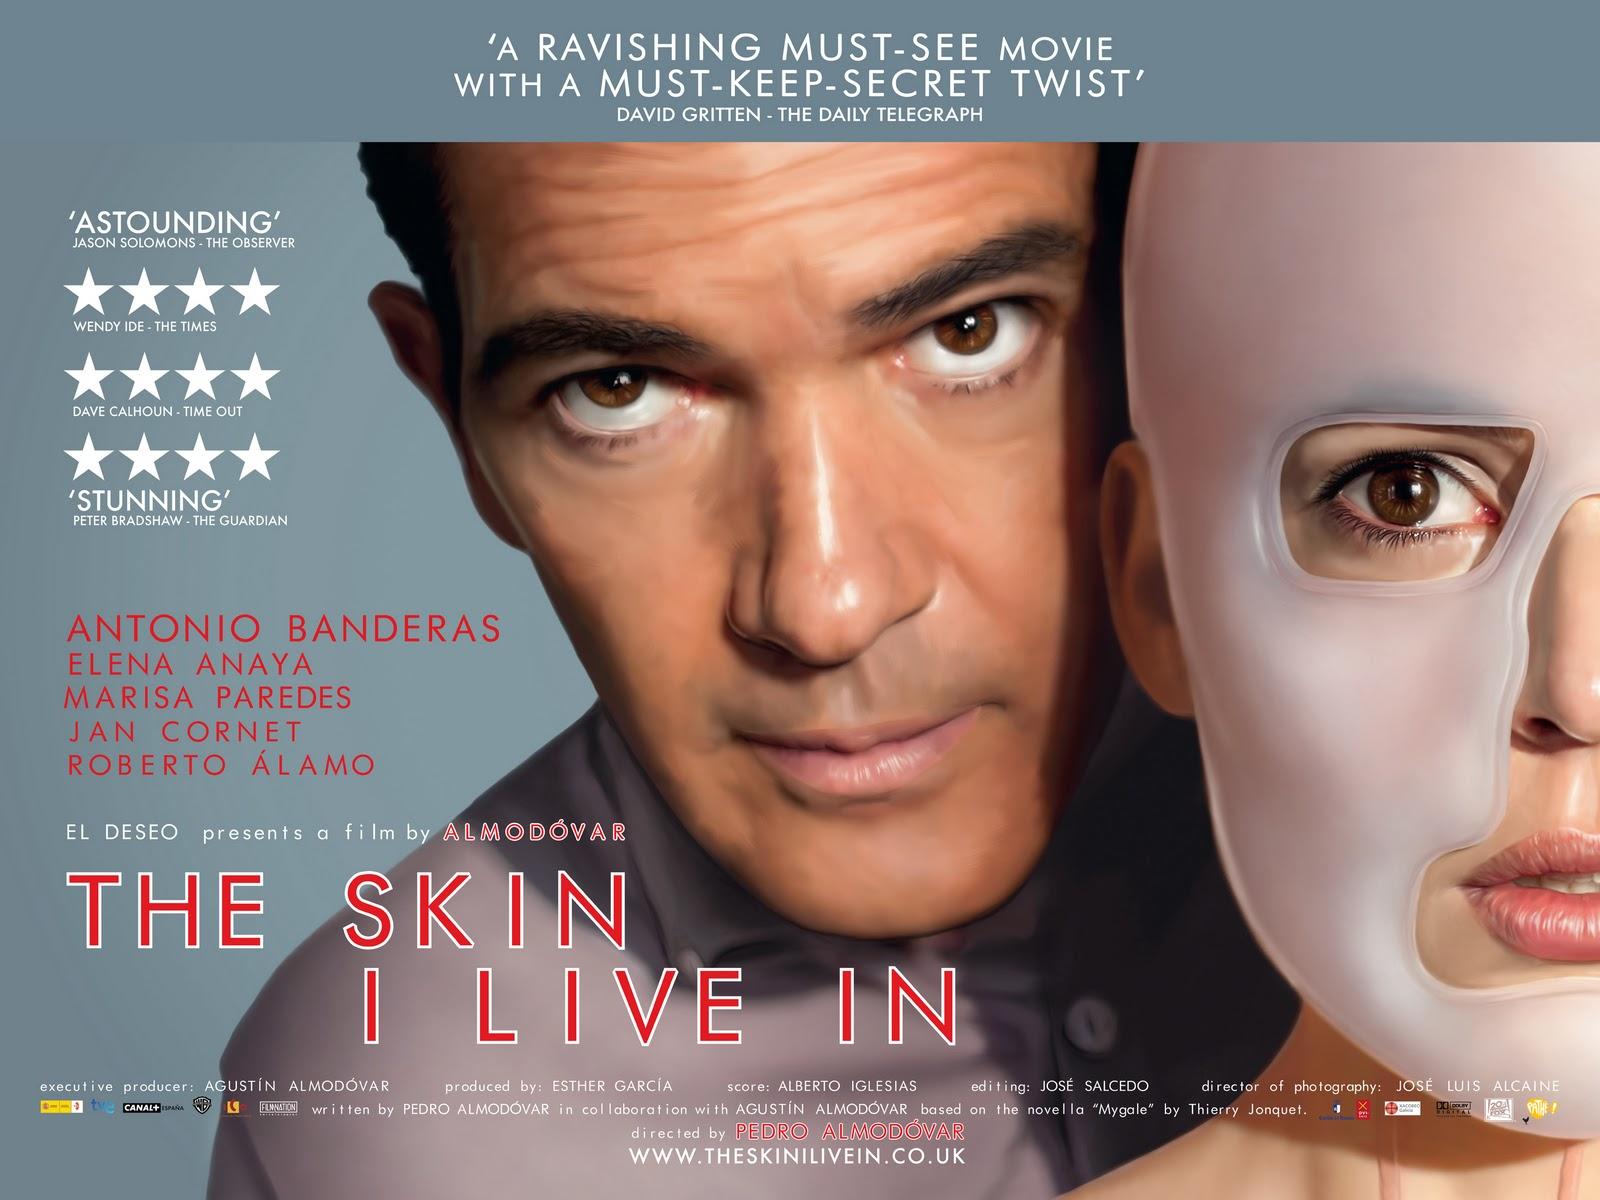 http://3.bp.blogspot.com/-gW7mnp-sQoc/Tou8LnhaY5I/AAAAAAAAAa8/KdCZ5pfLK-I/s1600/The-Skin-I-live-In-Huge-Poster.jpg